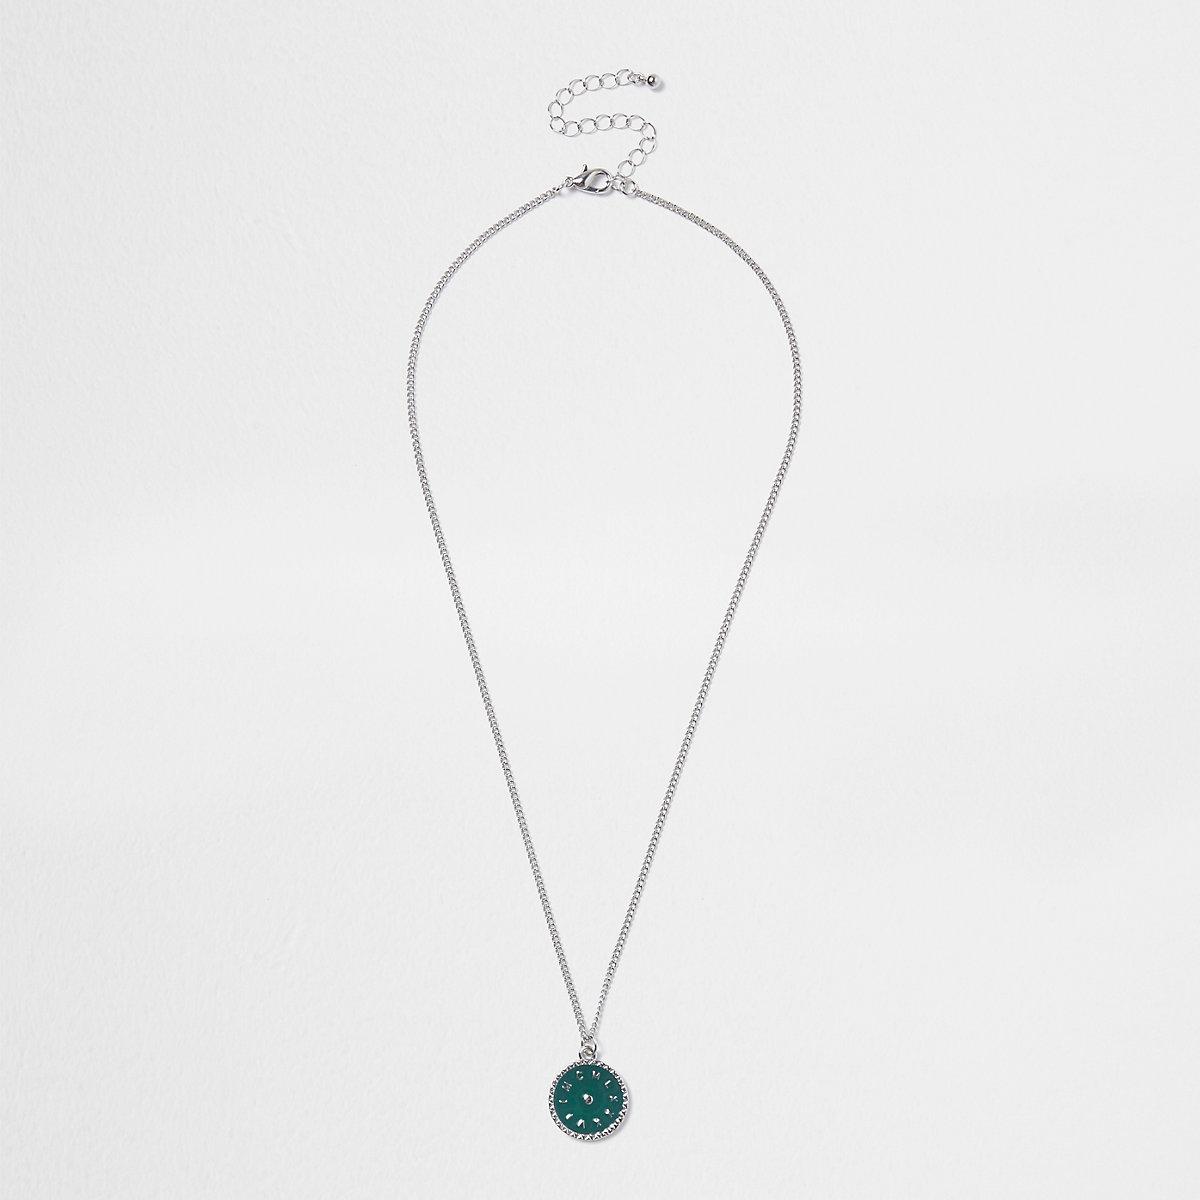 Silver tone green disc pendant necklace